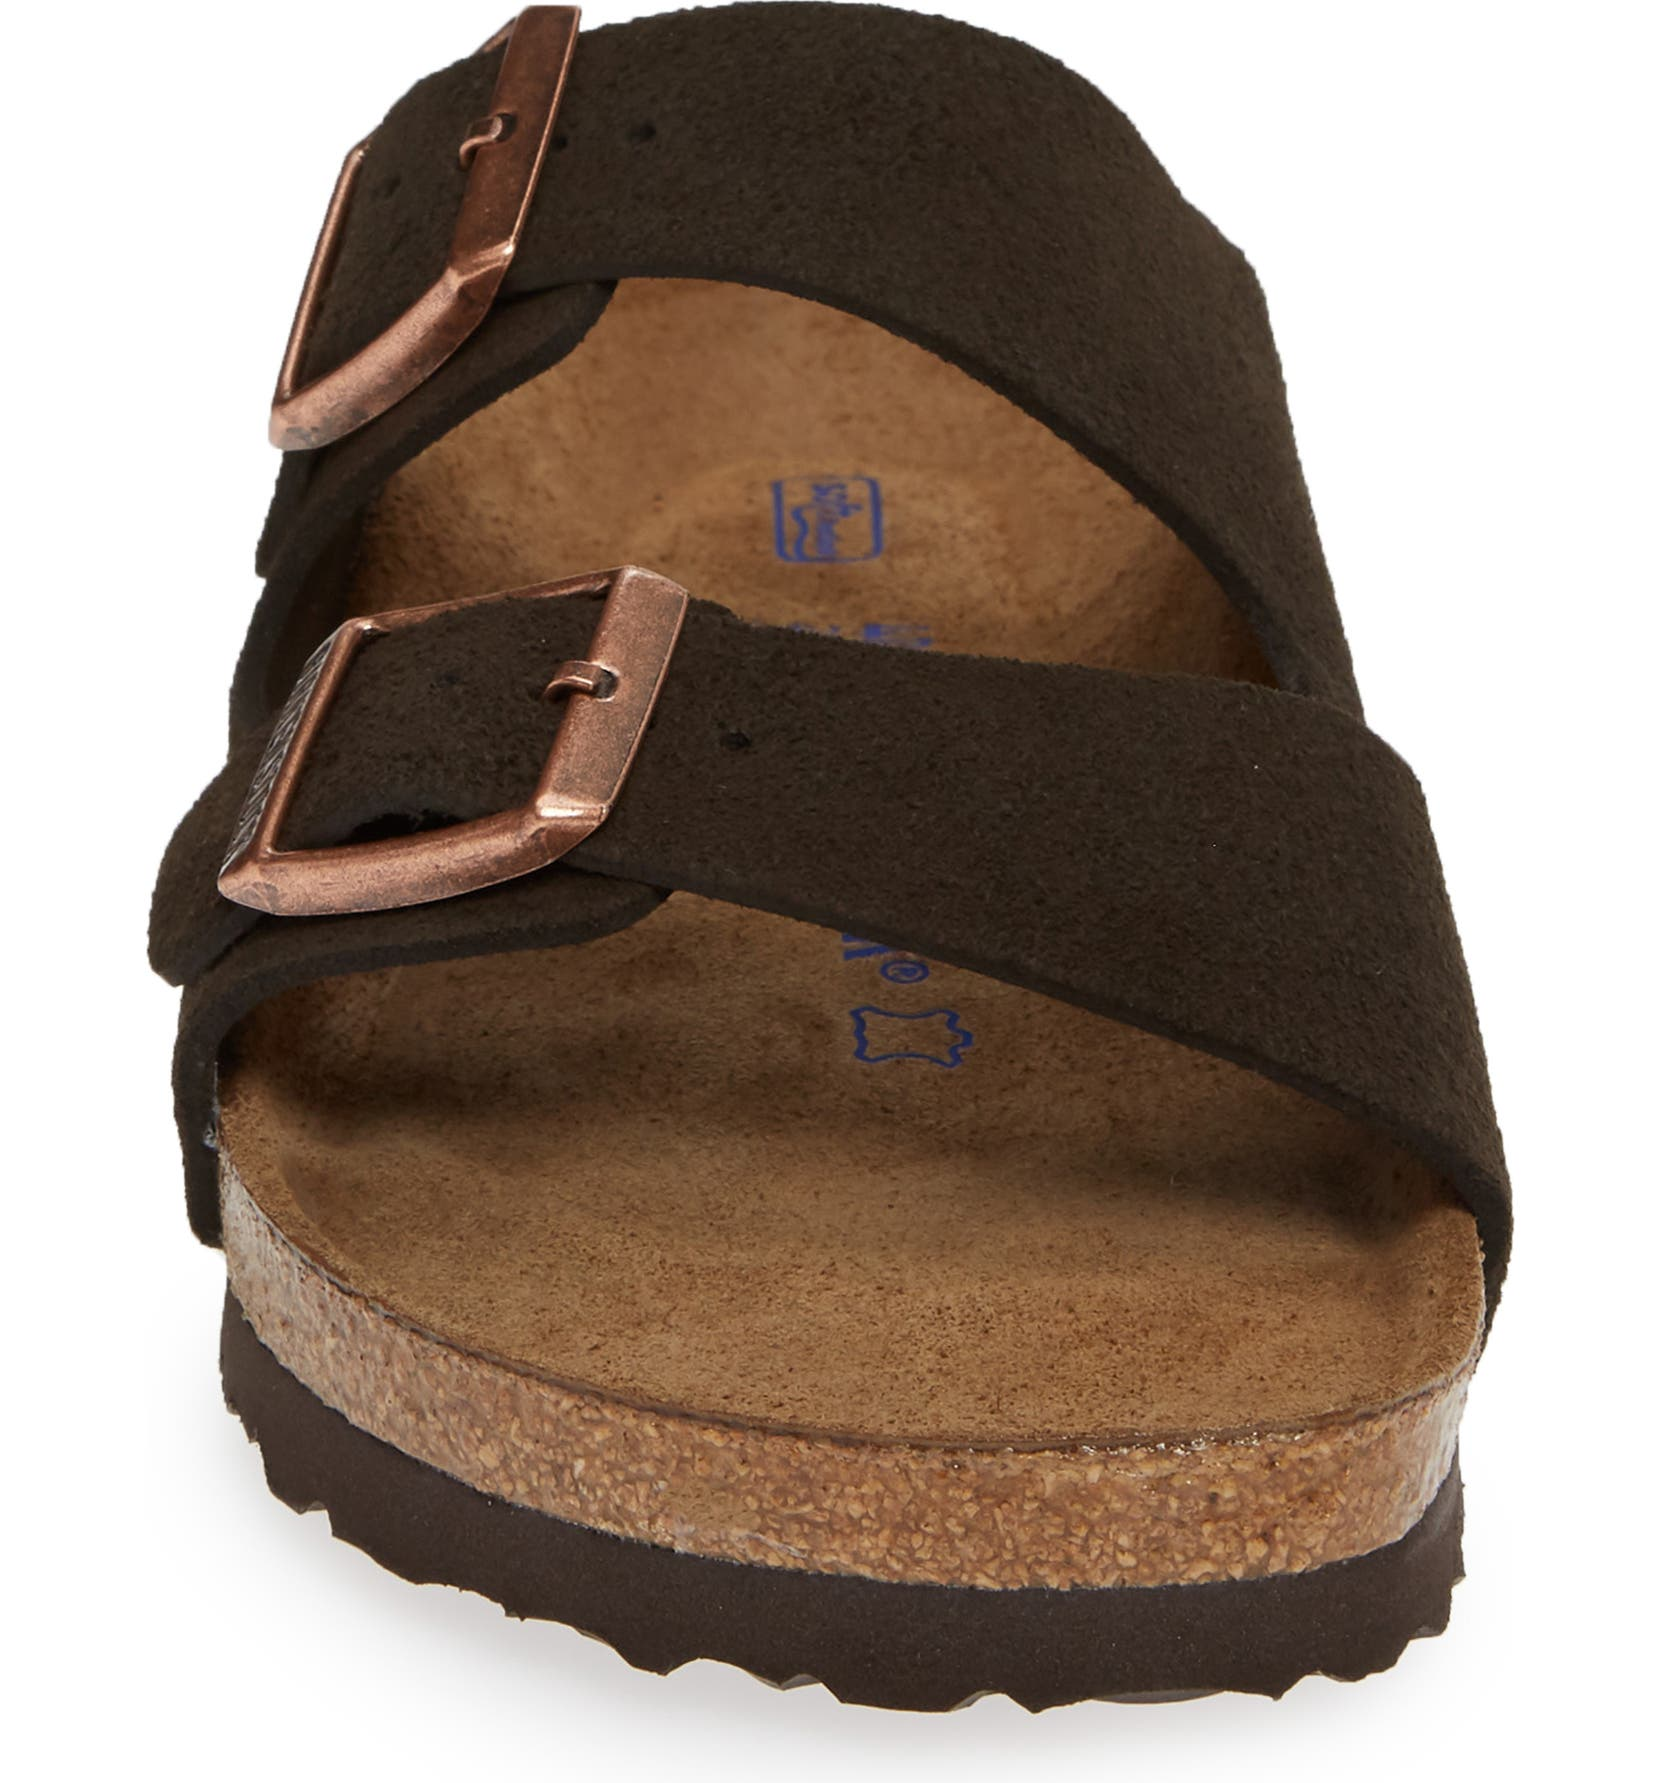 6b6e3adbf2 Birkenstock  Arizona  Soft Footbed Suede Sandal (Women)